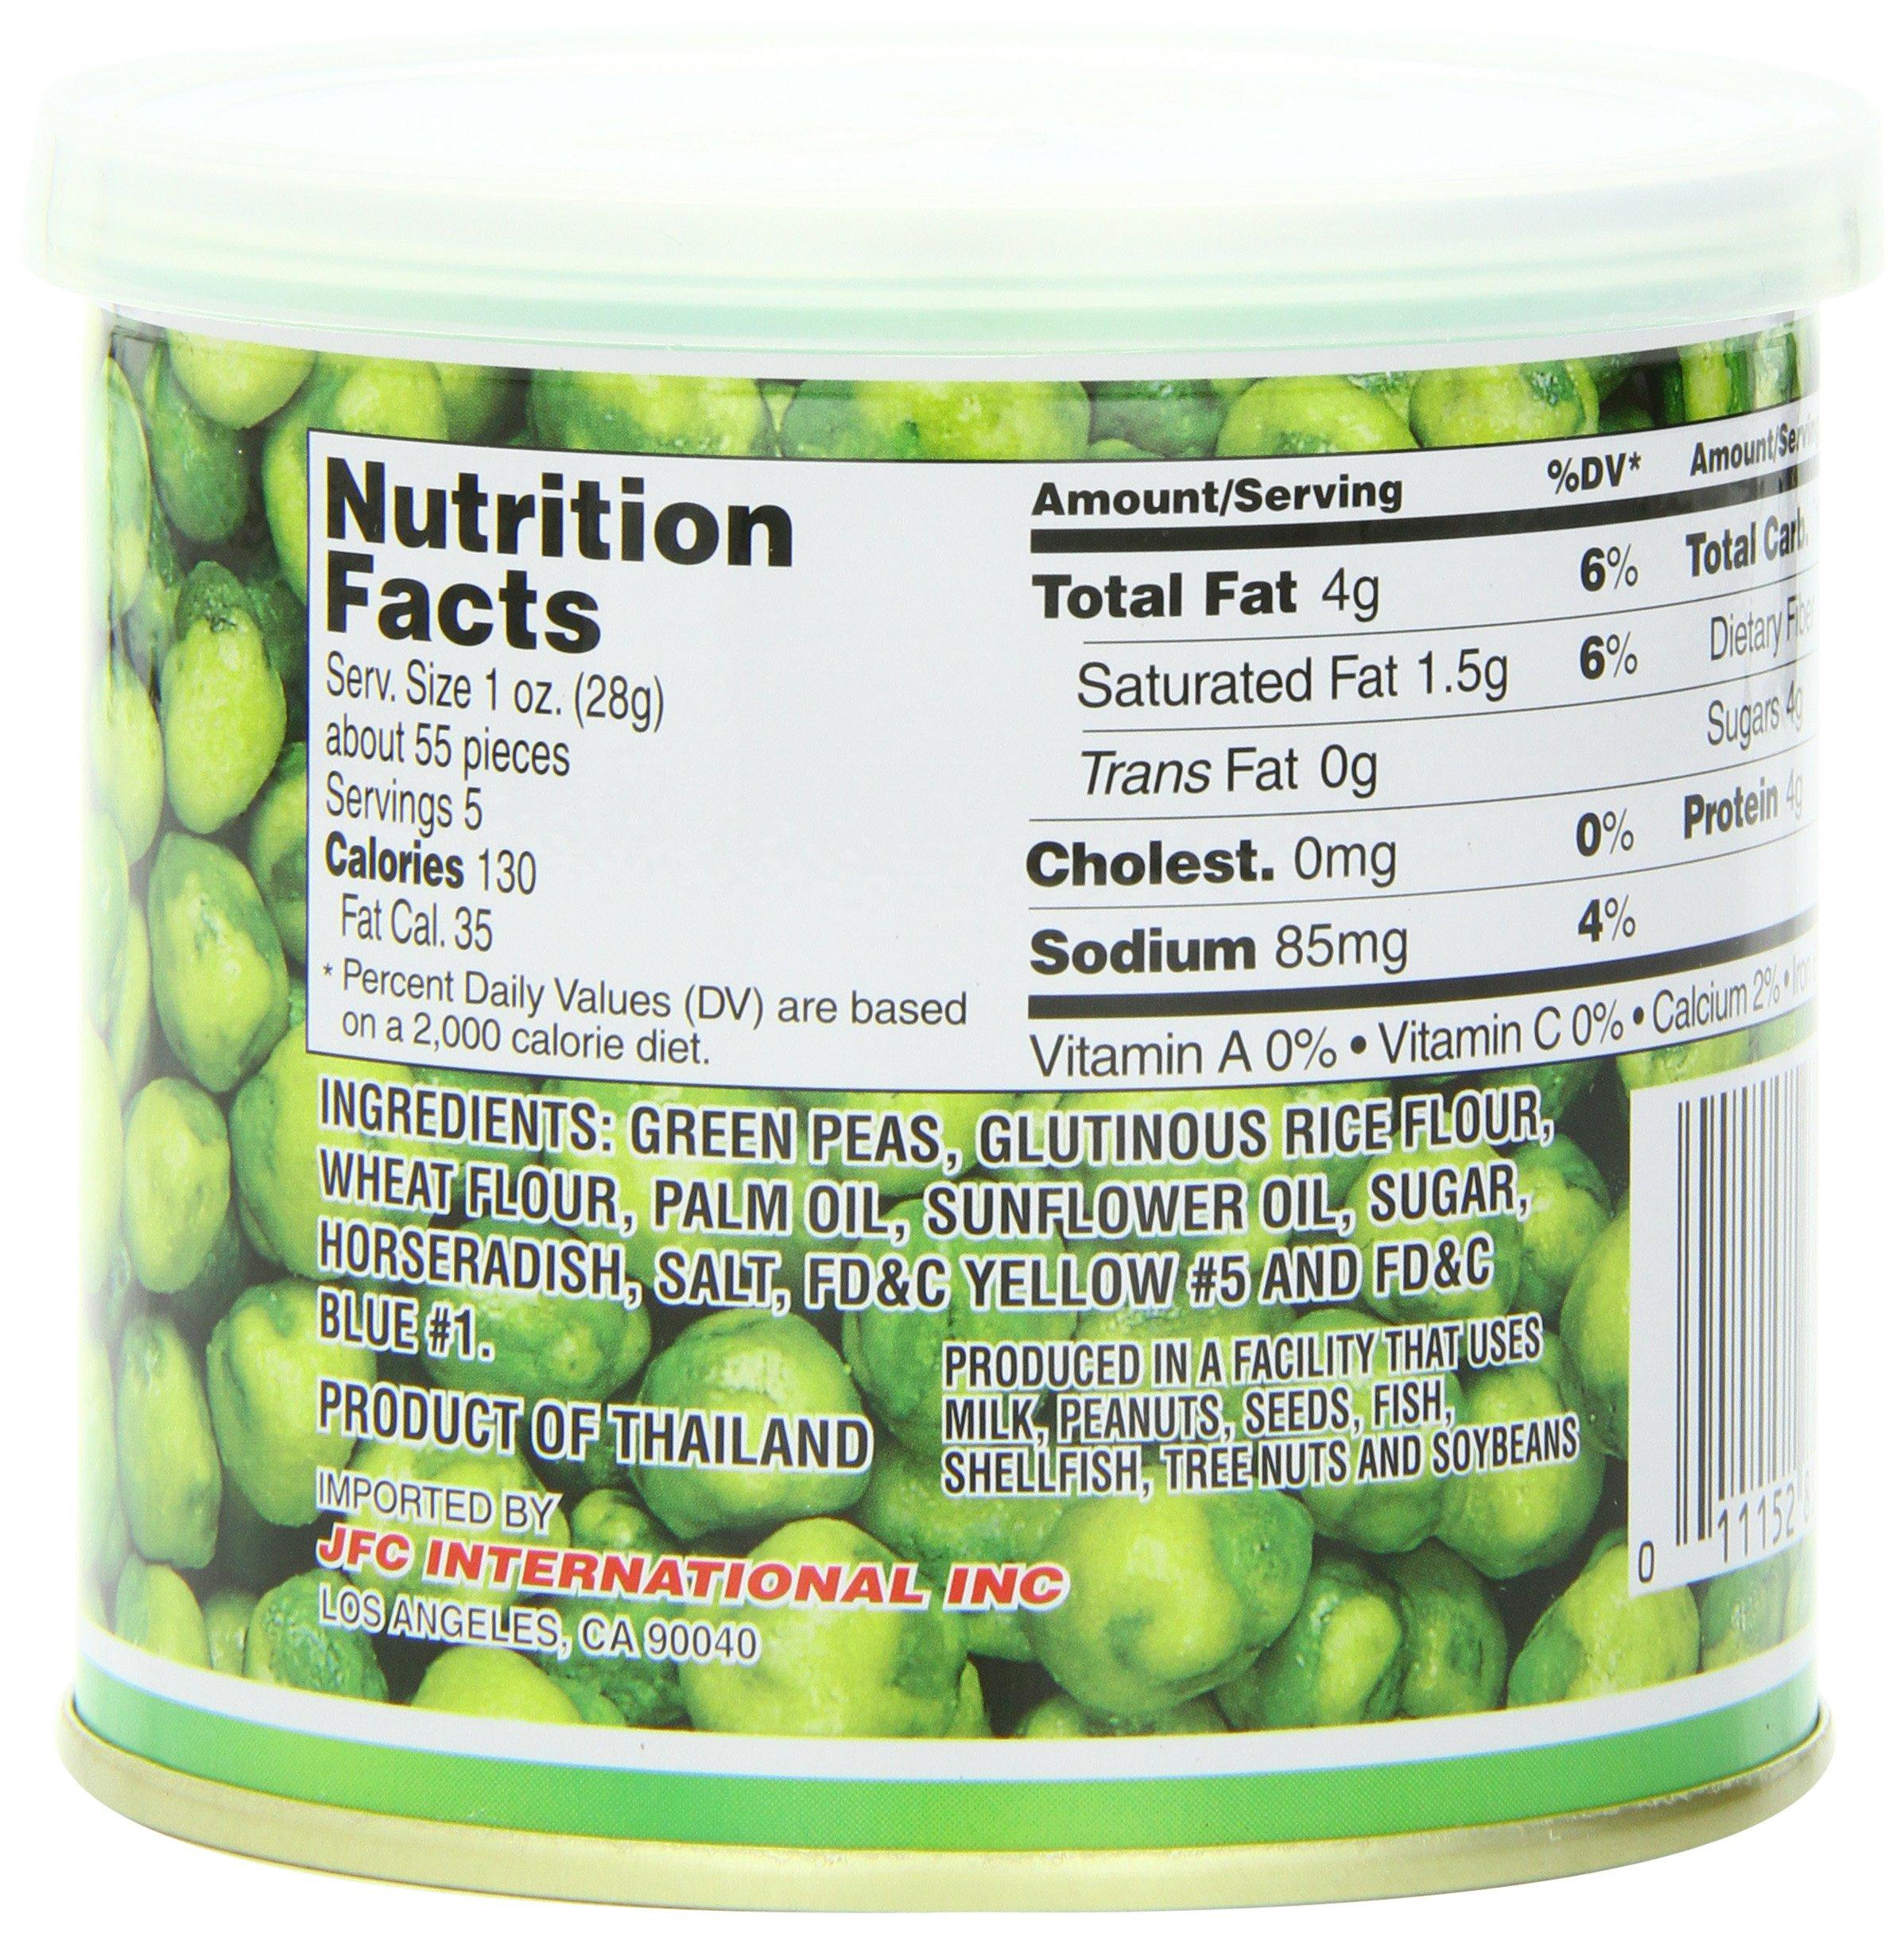 Hapi Hot Wasabi Peas, 4.9-Ounce Tins (Pack of 8) by HAPI (Image #1)